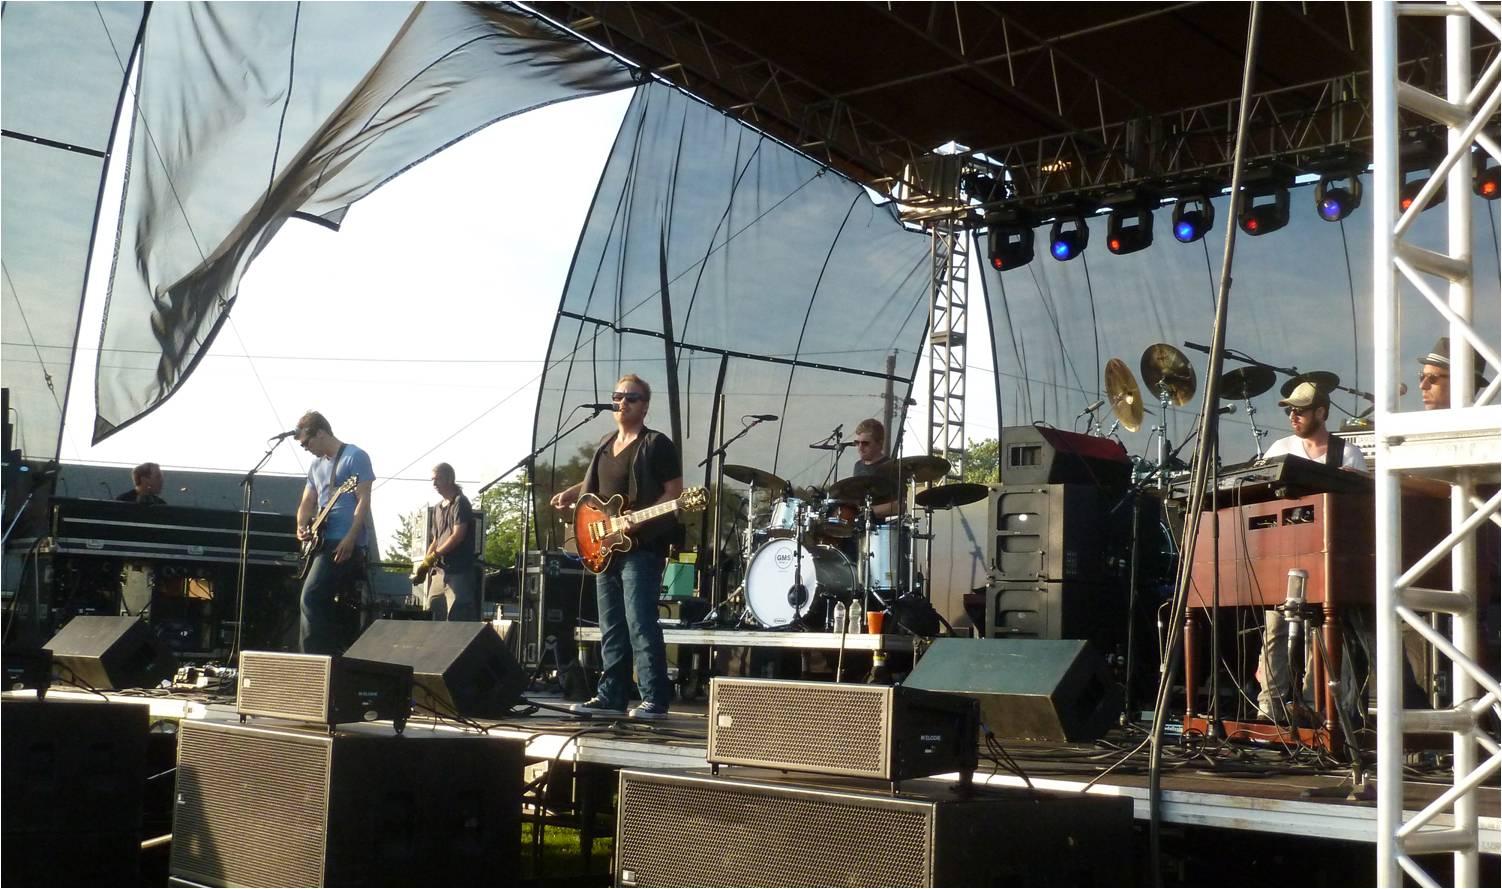 Broussard & Band 07-17-11 - Photo 3